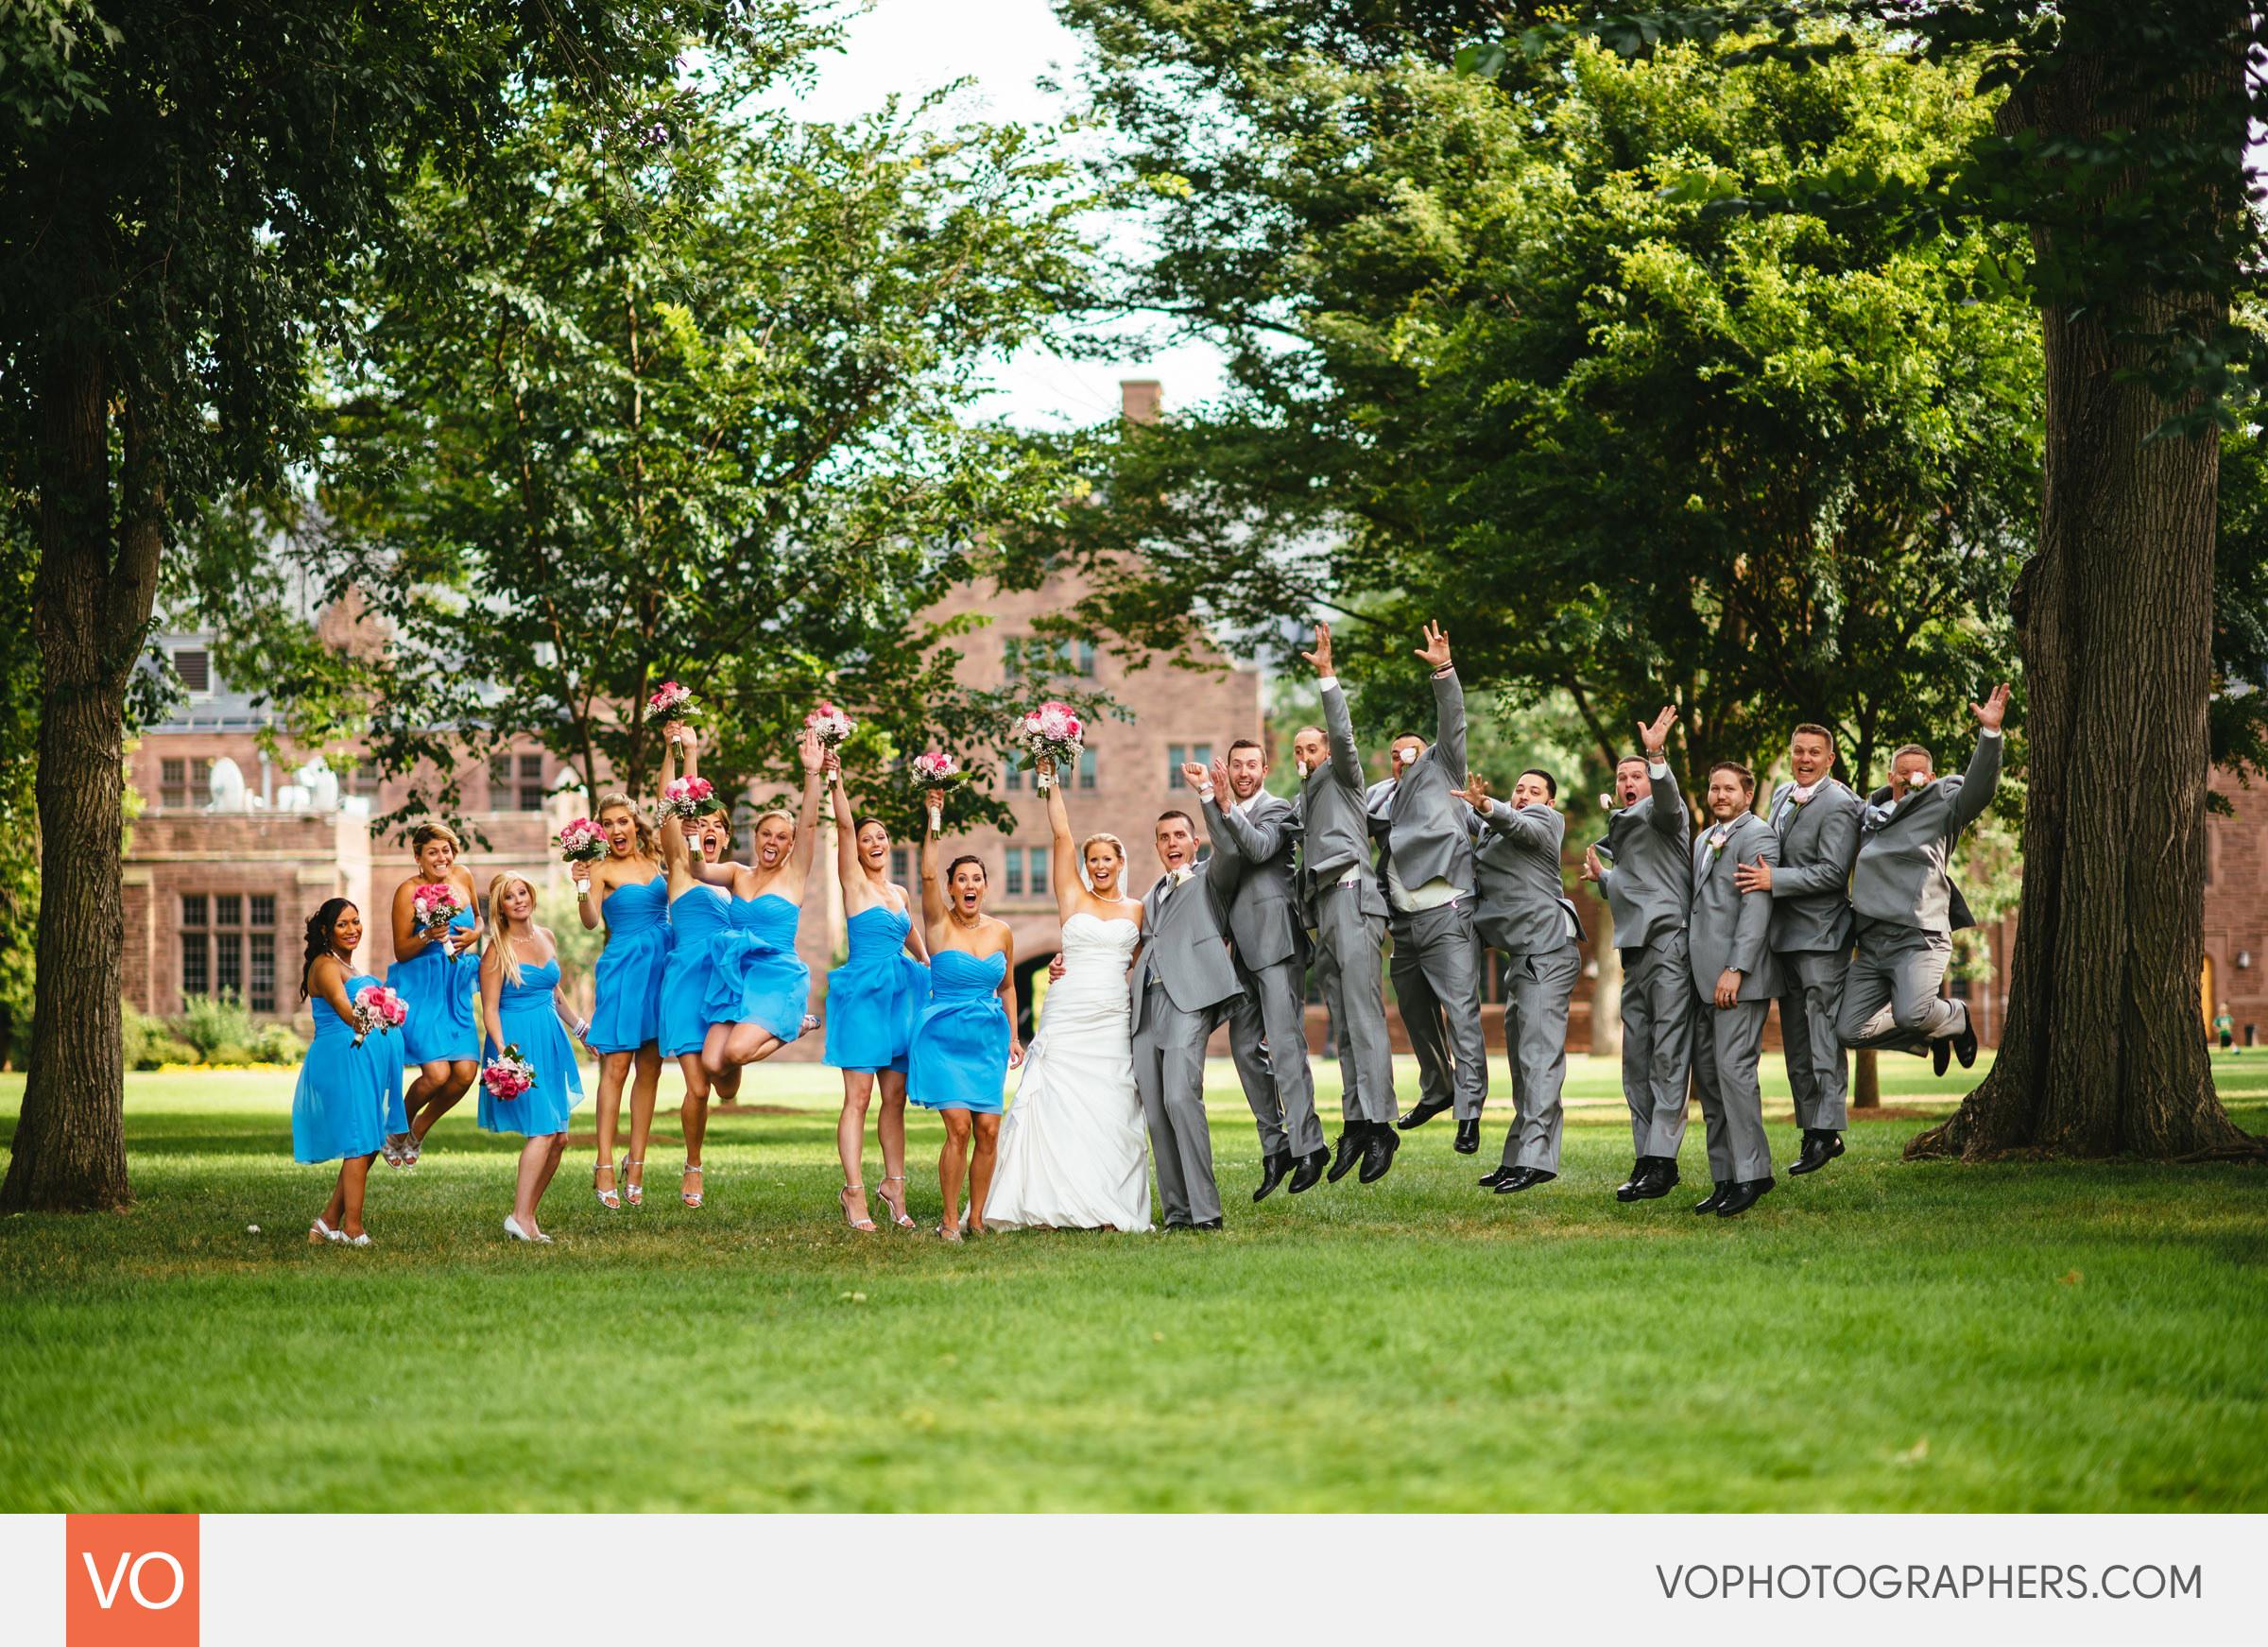 Doubletree-Hotel-Bristol-Wedding-Cathy-Chris-0015